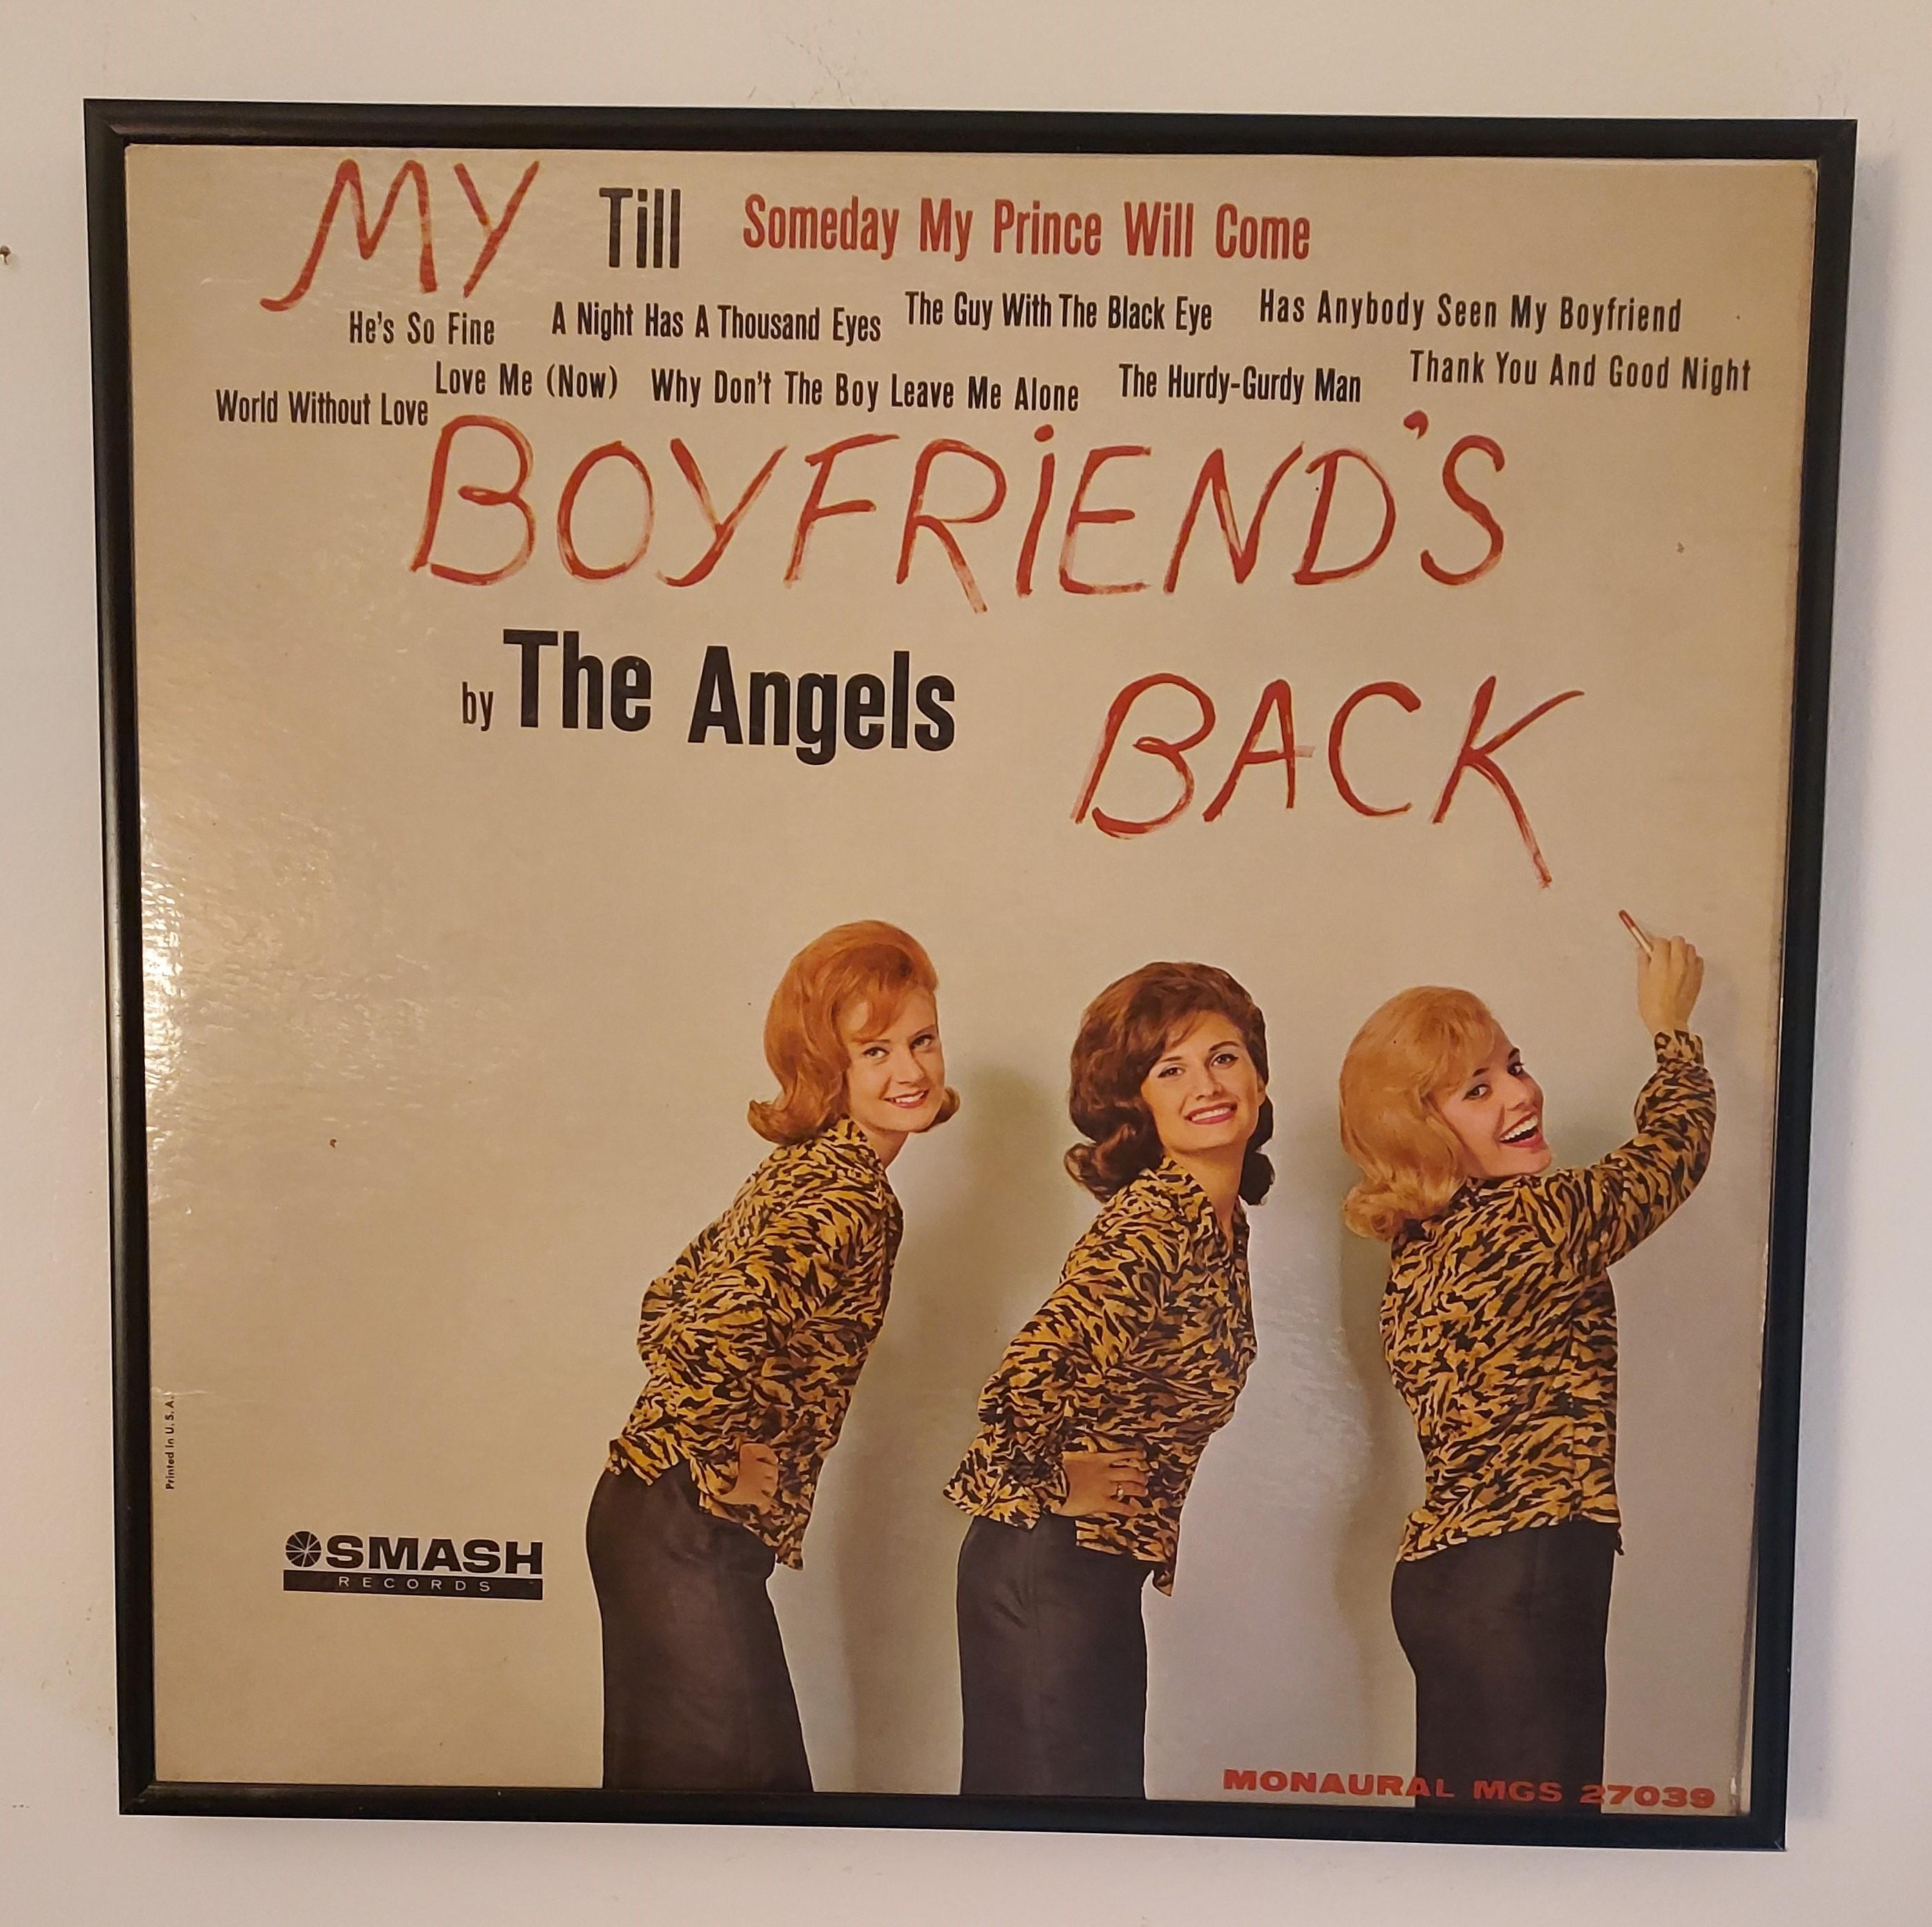 My Boyfriend's Back vinyl LP at vinyl record memories.